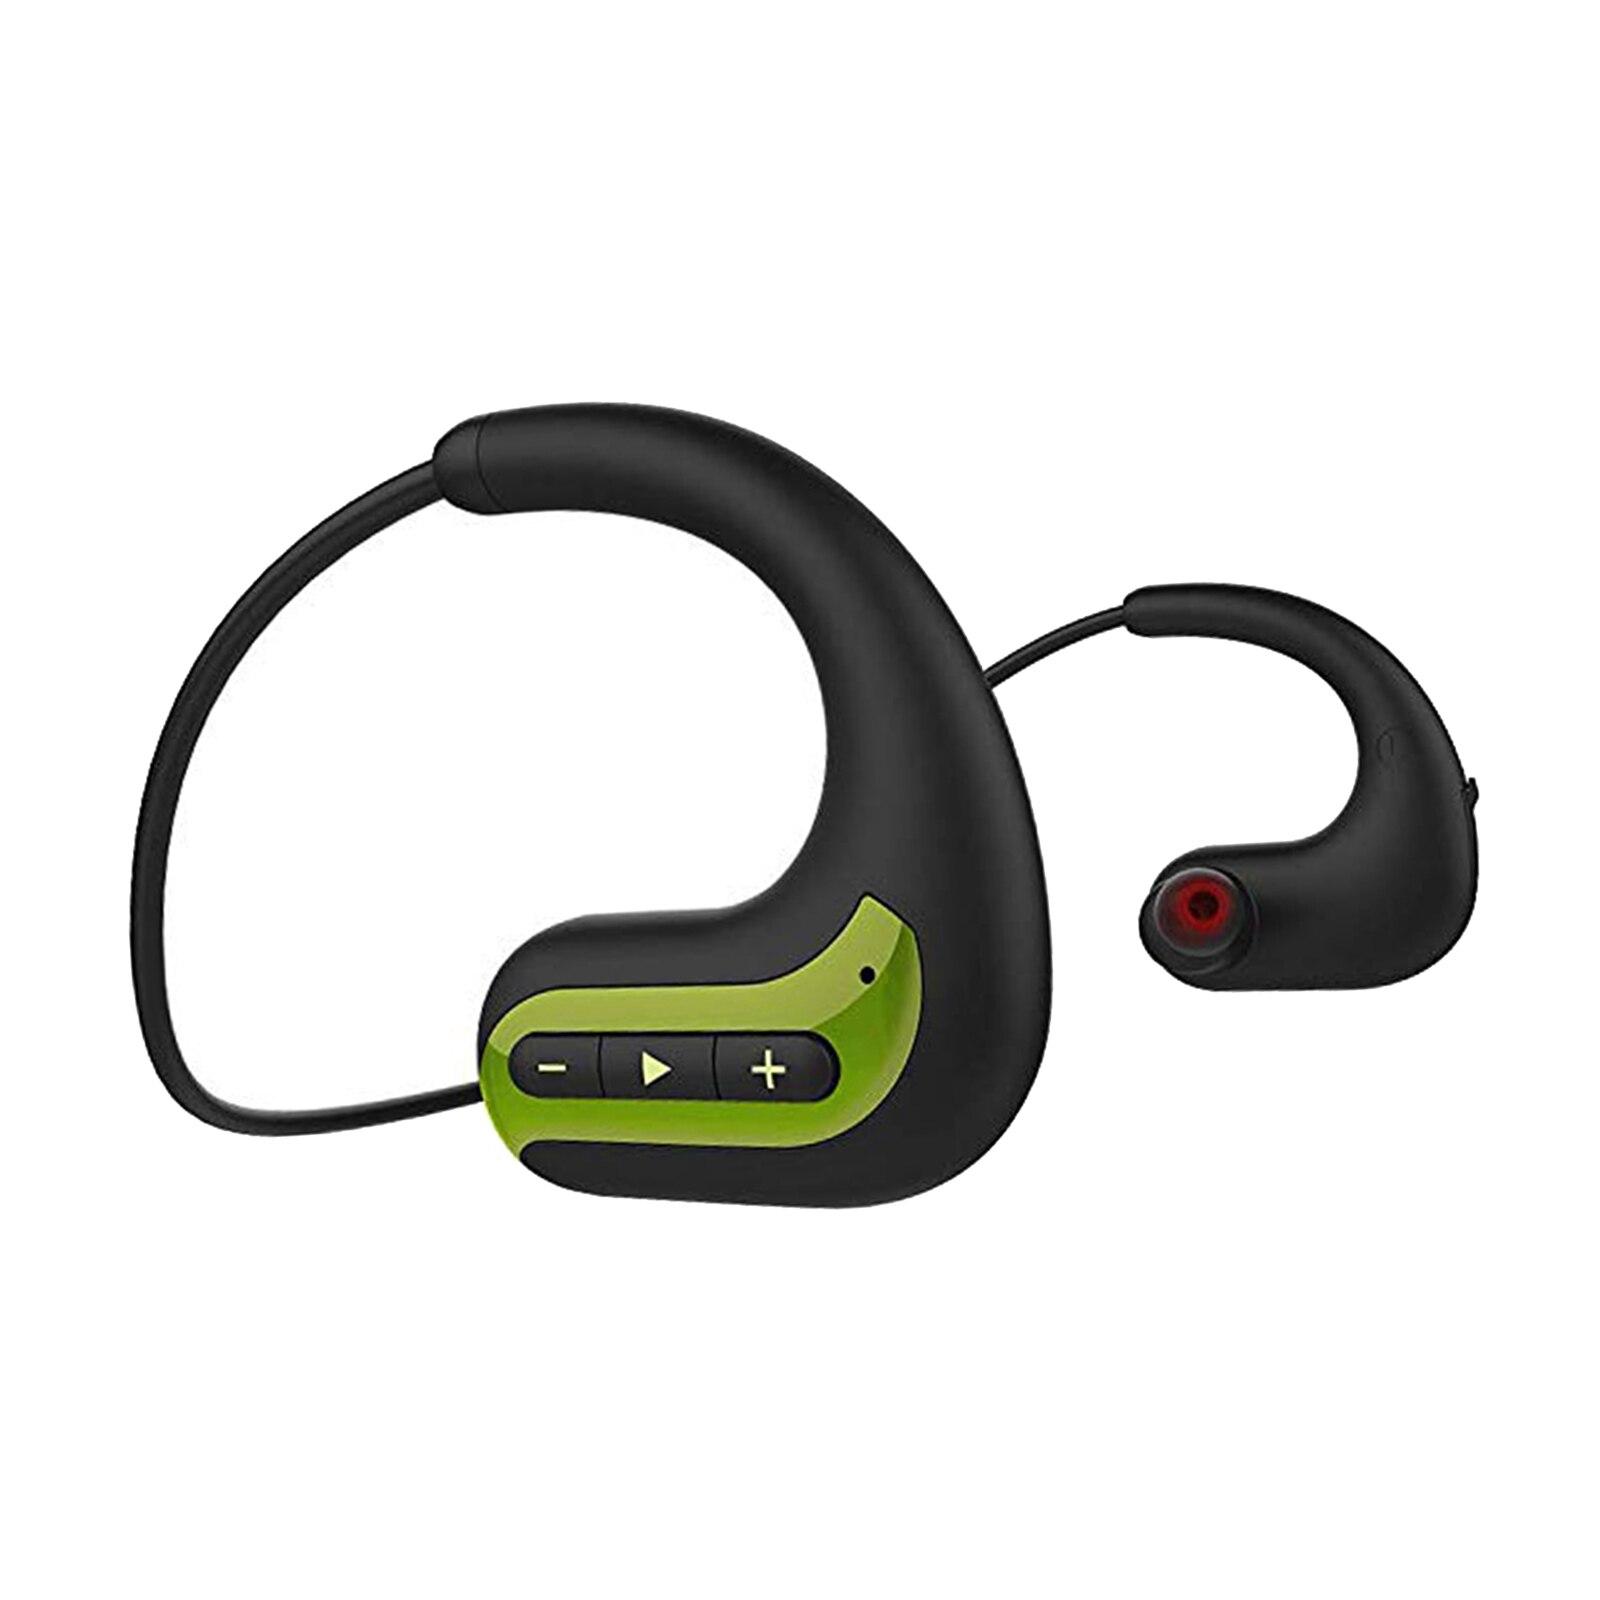 S1200 8gb mp3 player fones de ouvido